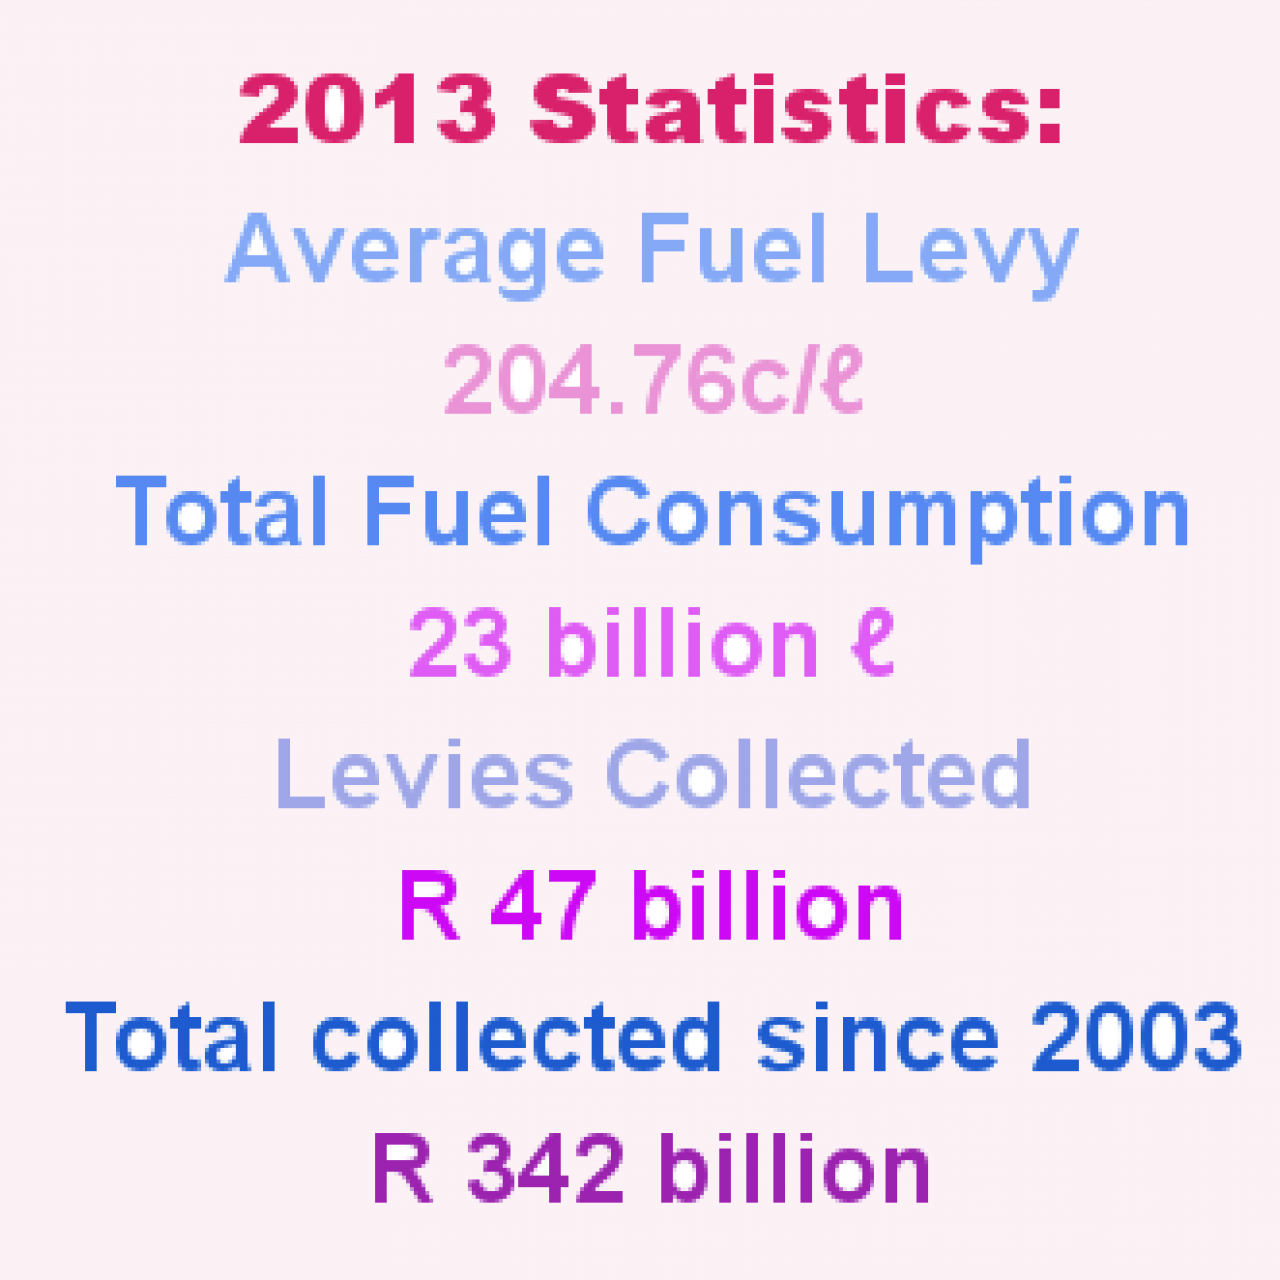 Fuel levy stats 2013